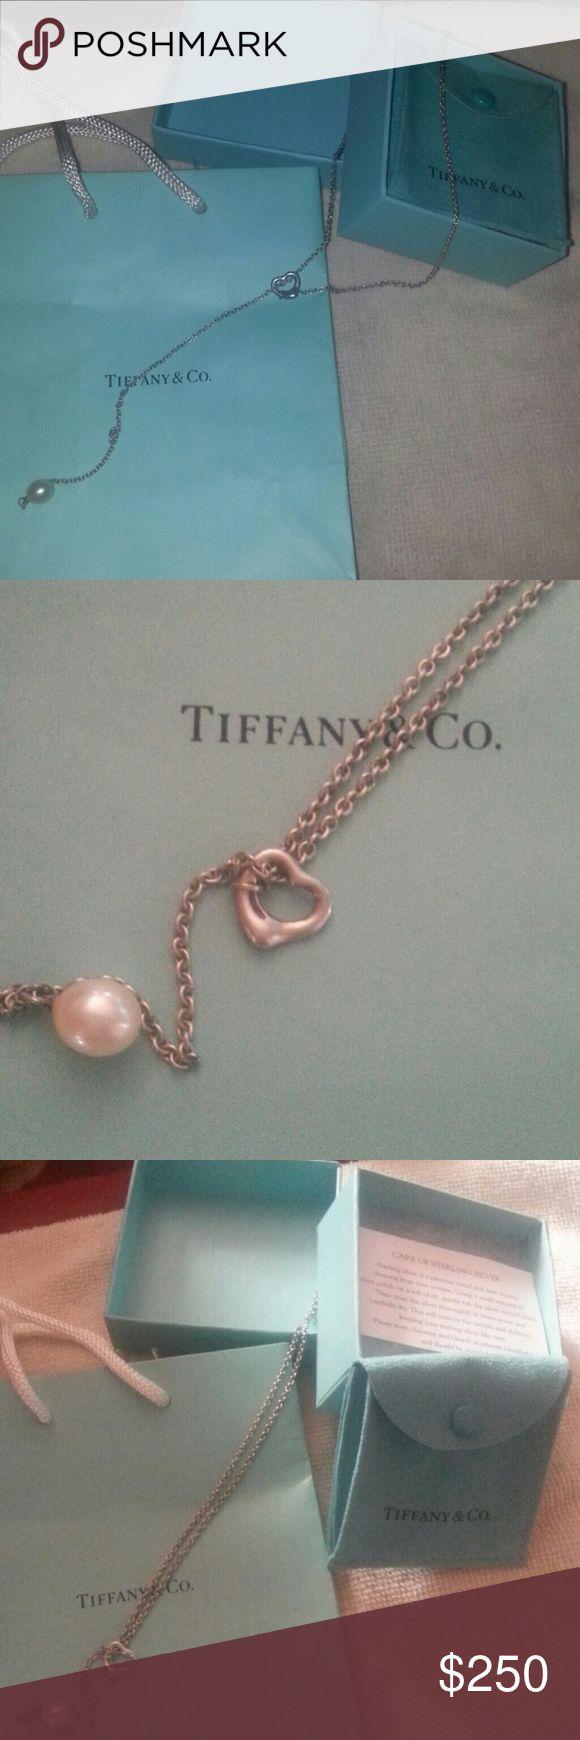 Tiffanys Tiffanys pearl necklace Tiffany & Co. Jewelry Necklaces